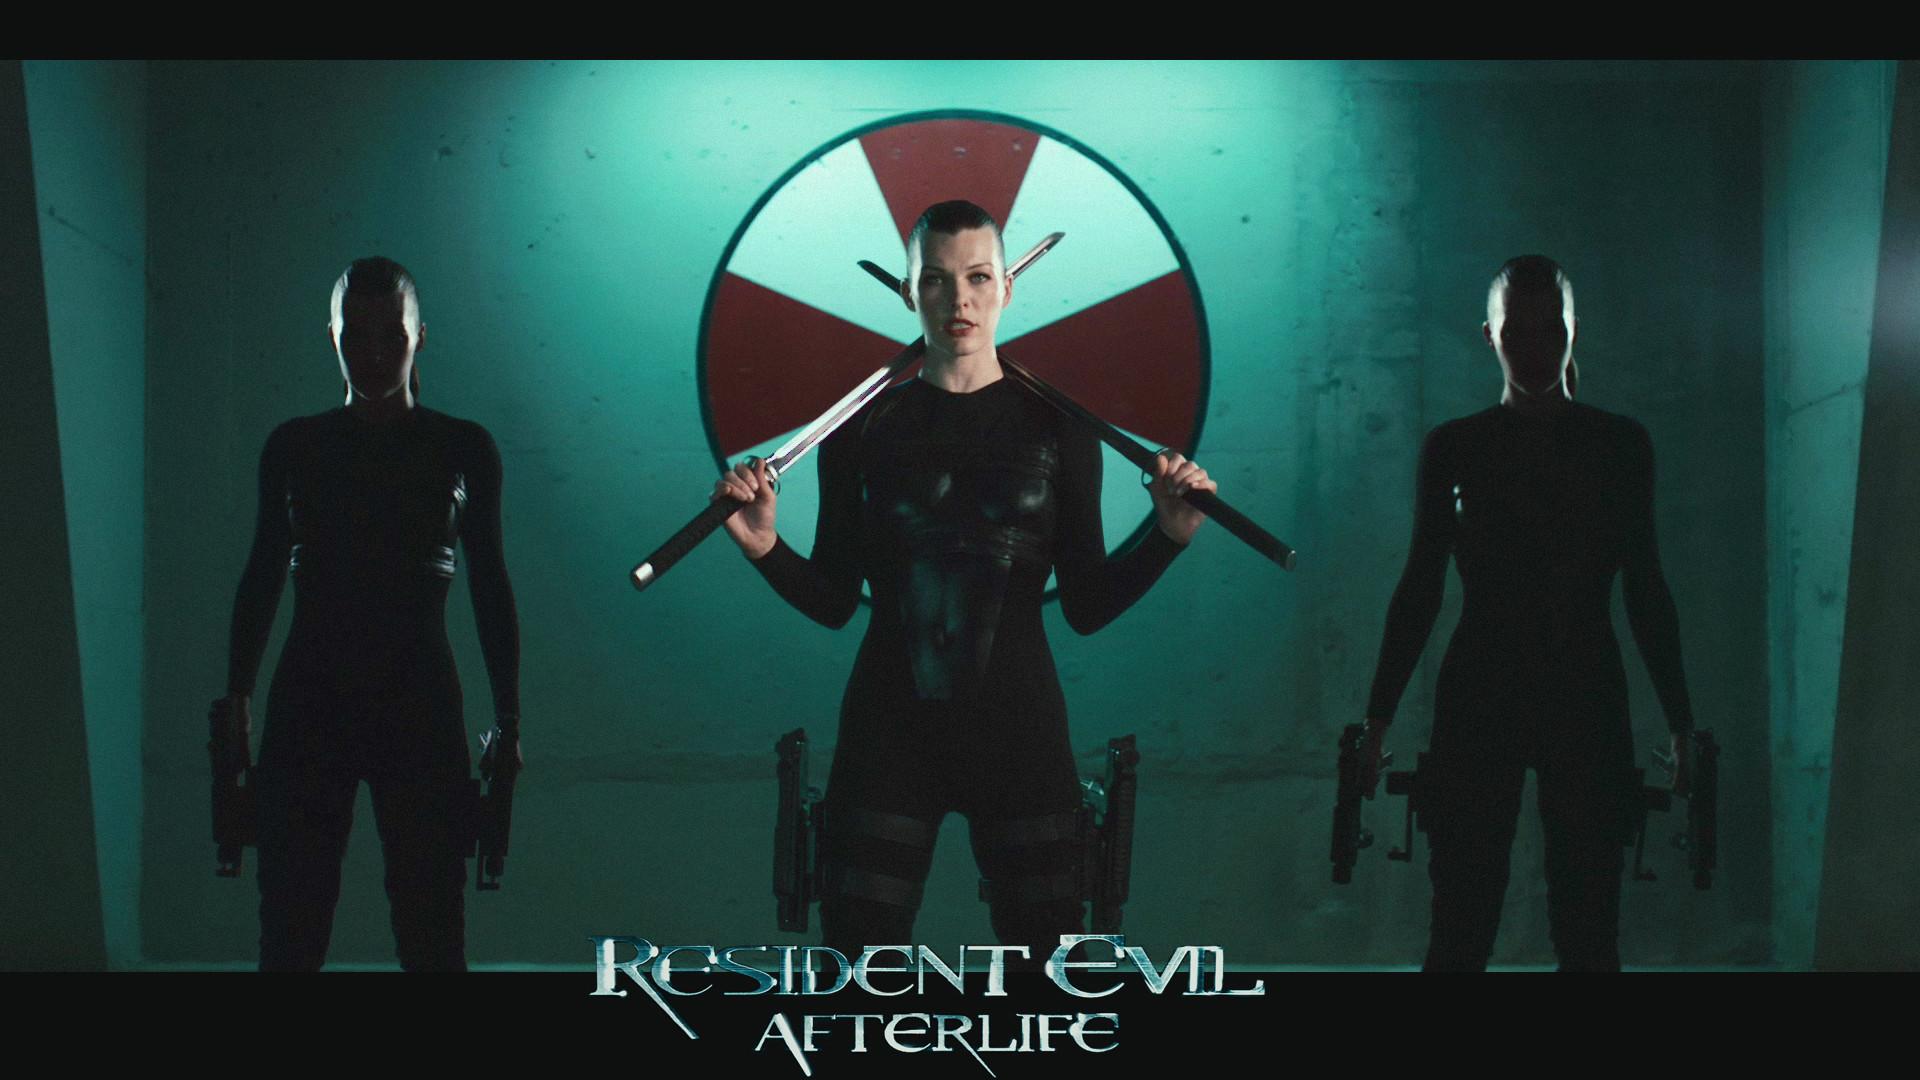 resident evil afterlife mp3 free